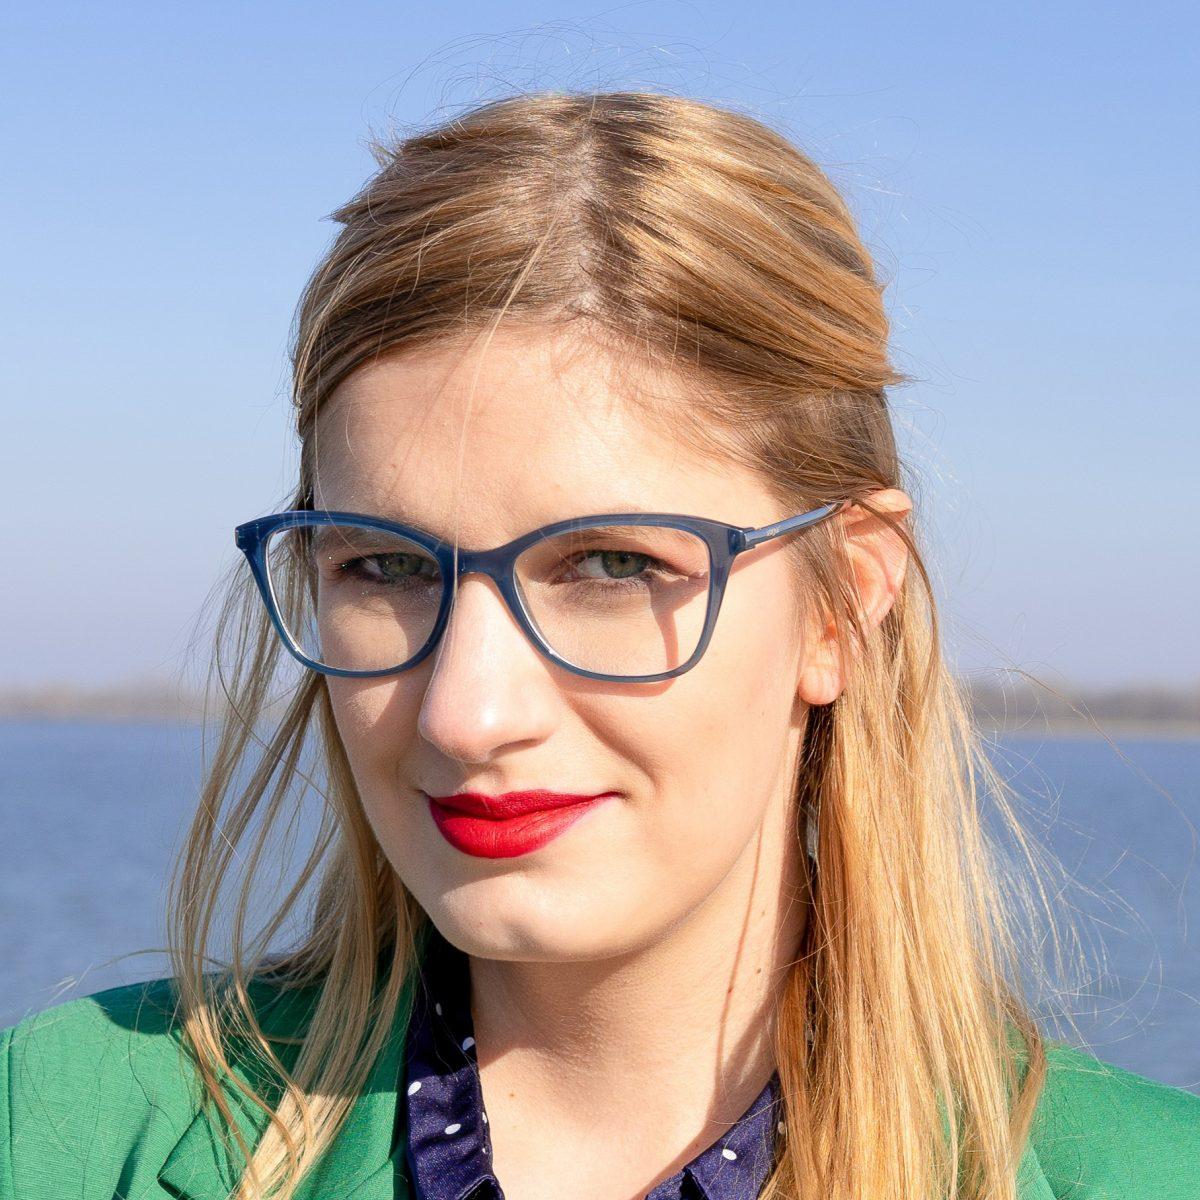 Miroslava Germanova